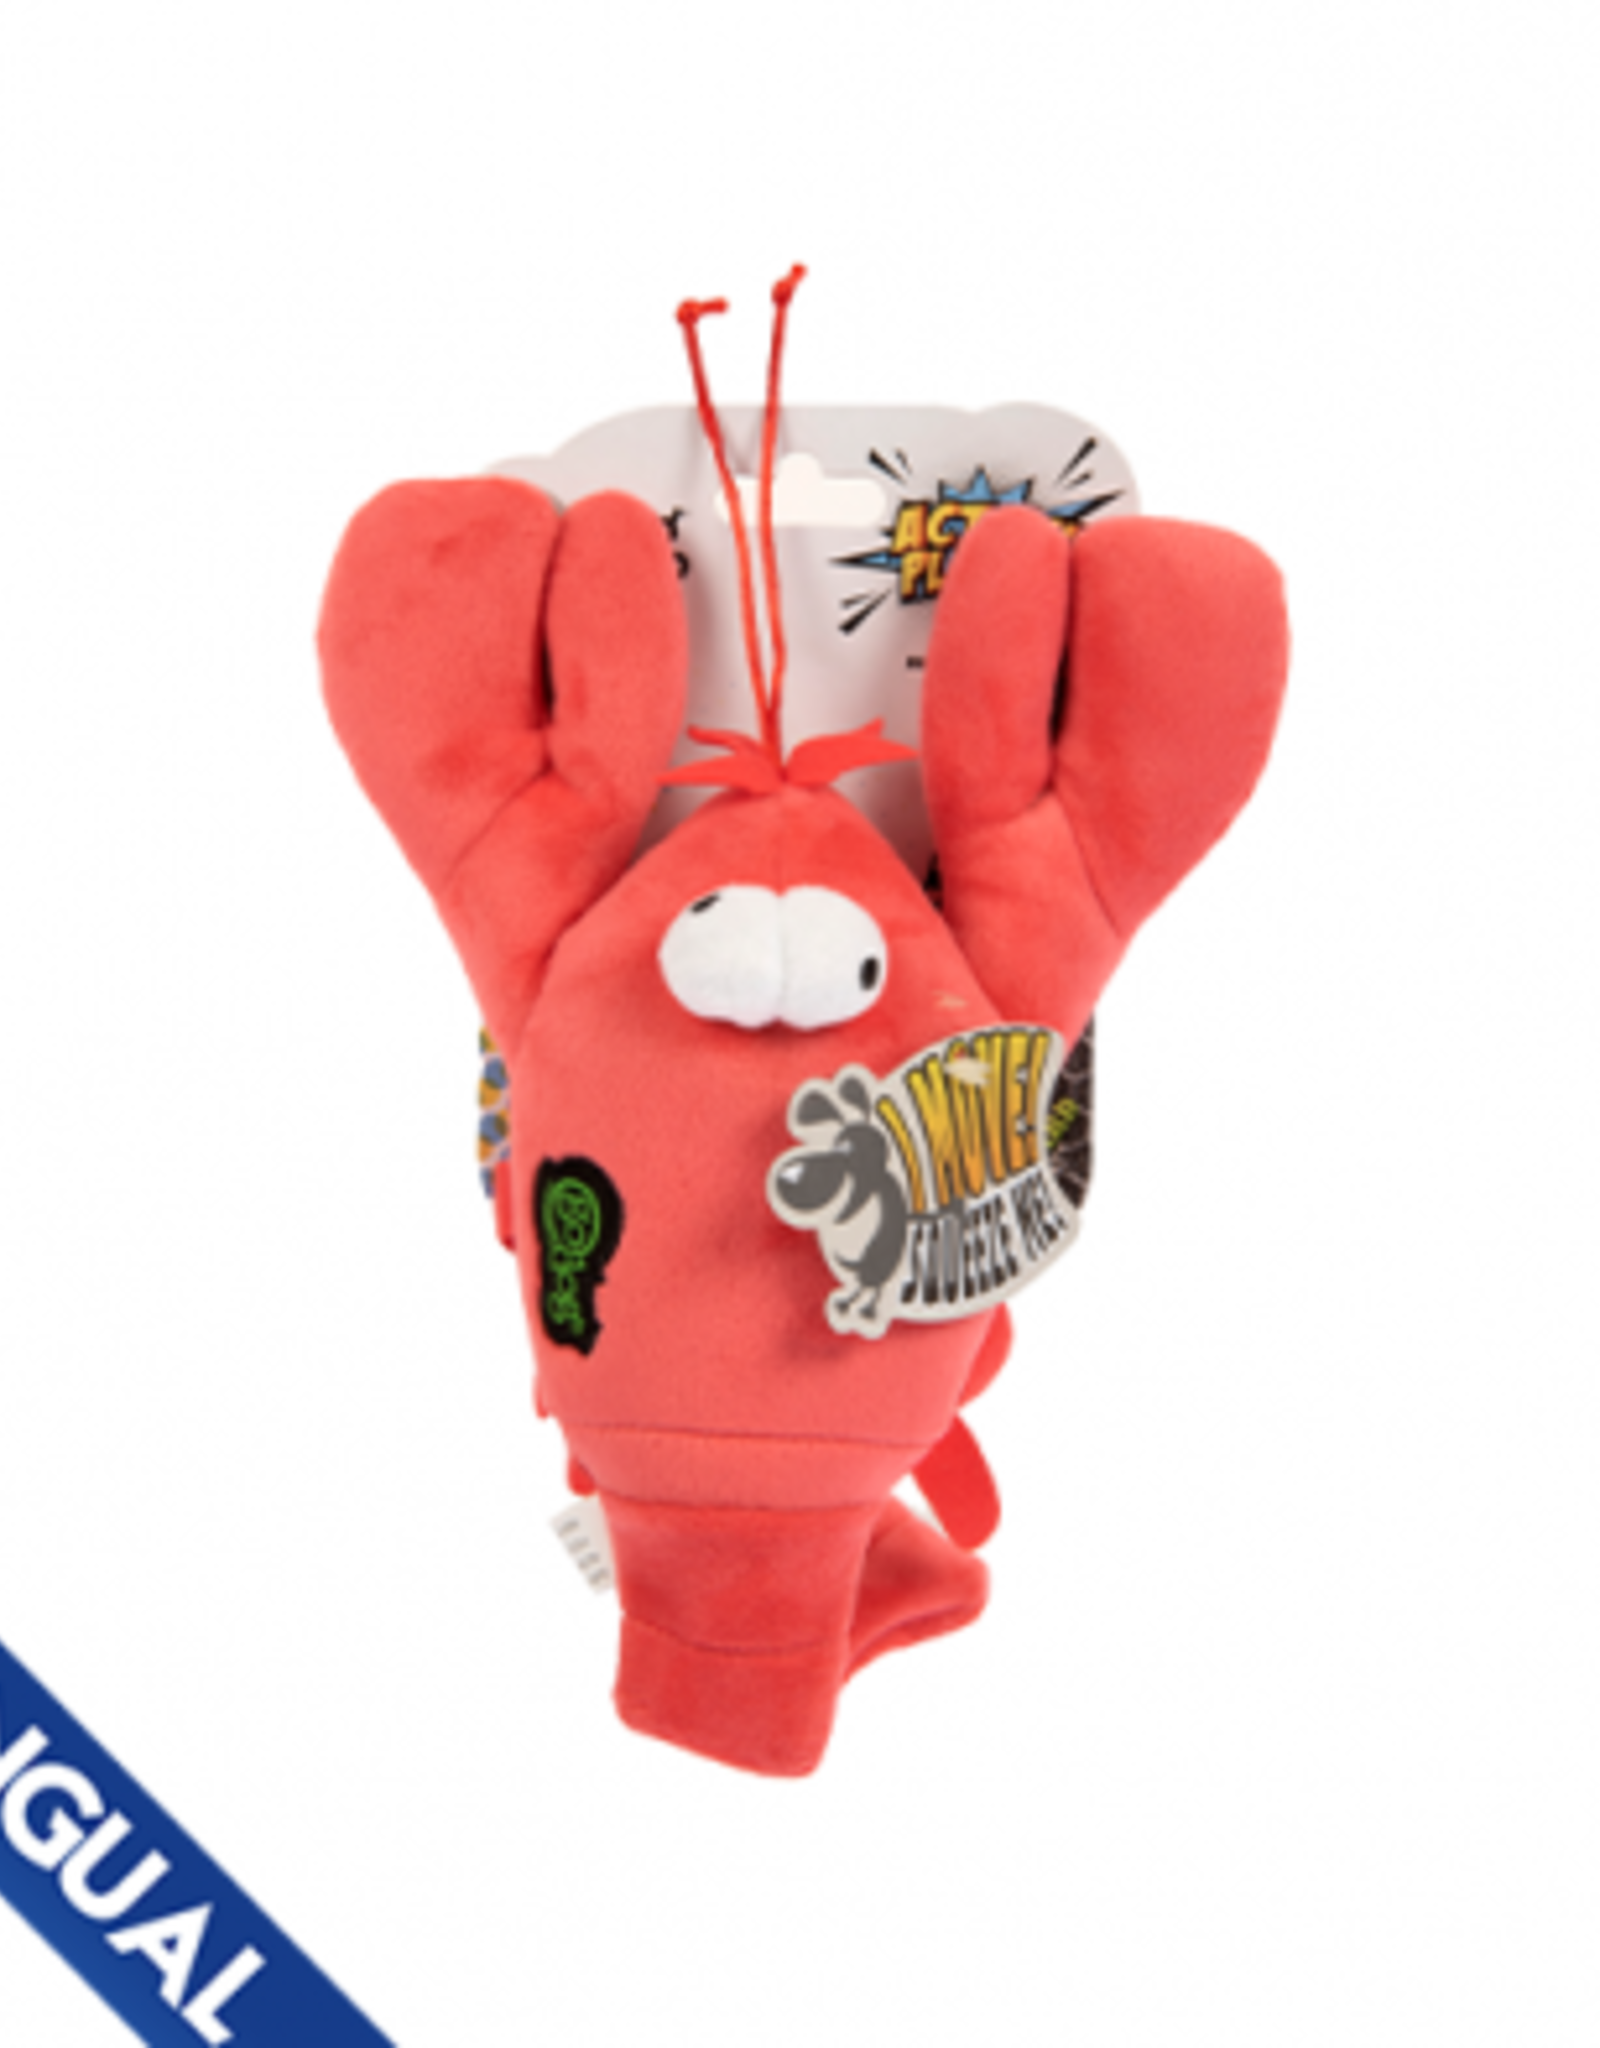 GoDog Go Dog Chew Guard Action Plush Lobster